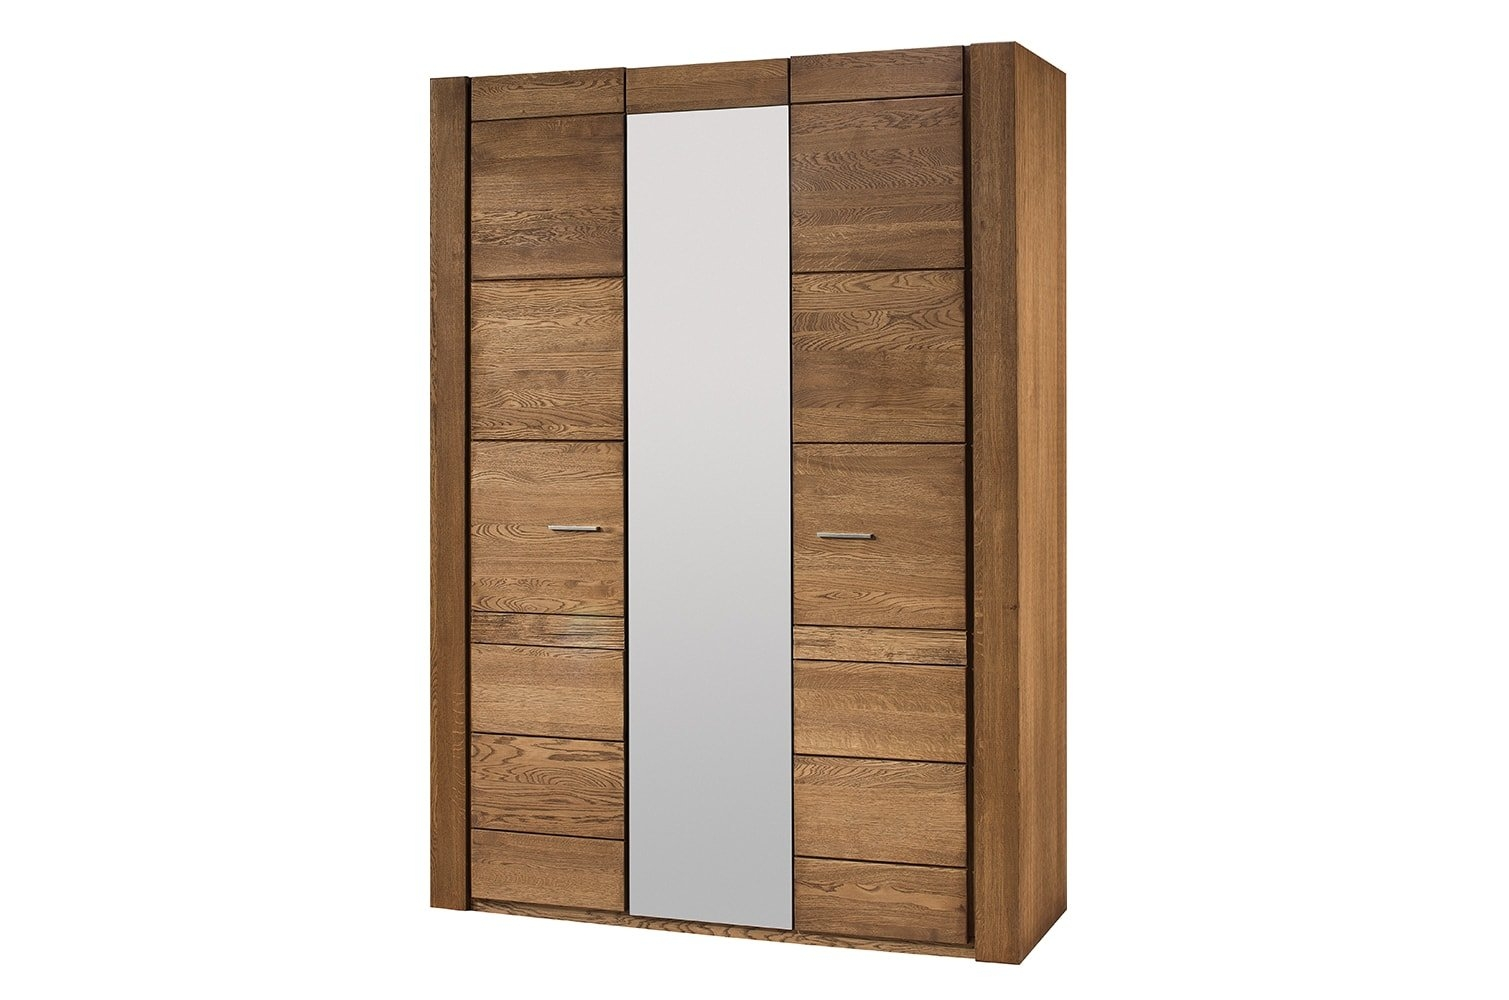 Dulap din furnir si pal, cu 3 usi si oglinda Velvet 73 Stejar Rustic, l160xA60xH225 cm